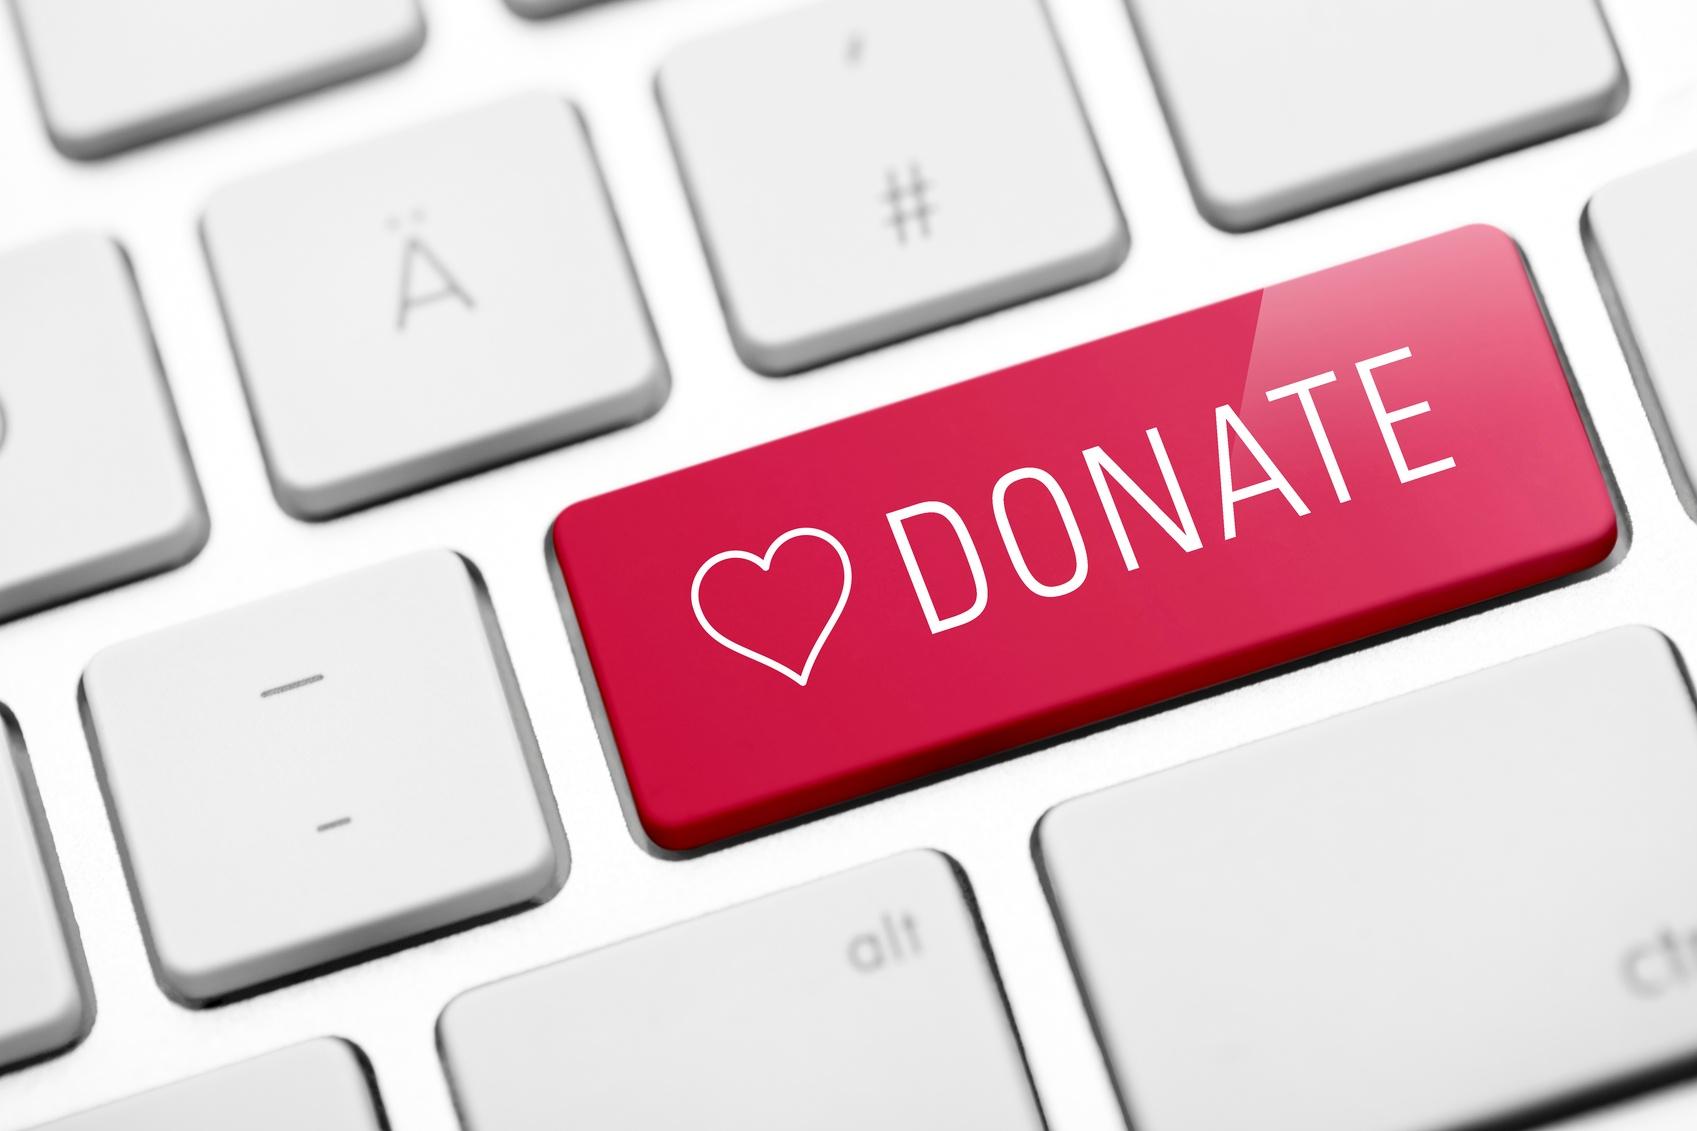 online-donate-key-on-keyboard-000074173491_Medium (1).jpg